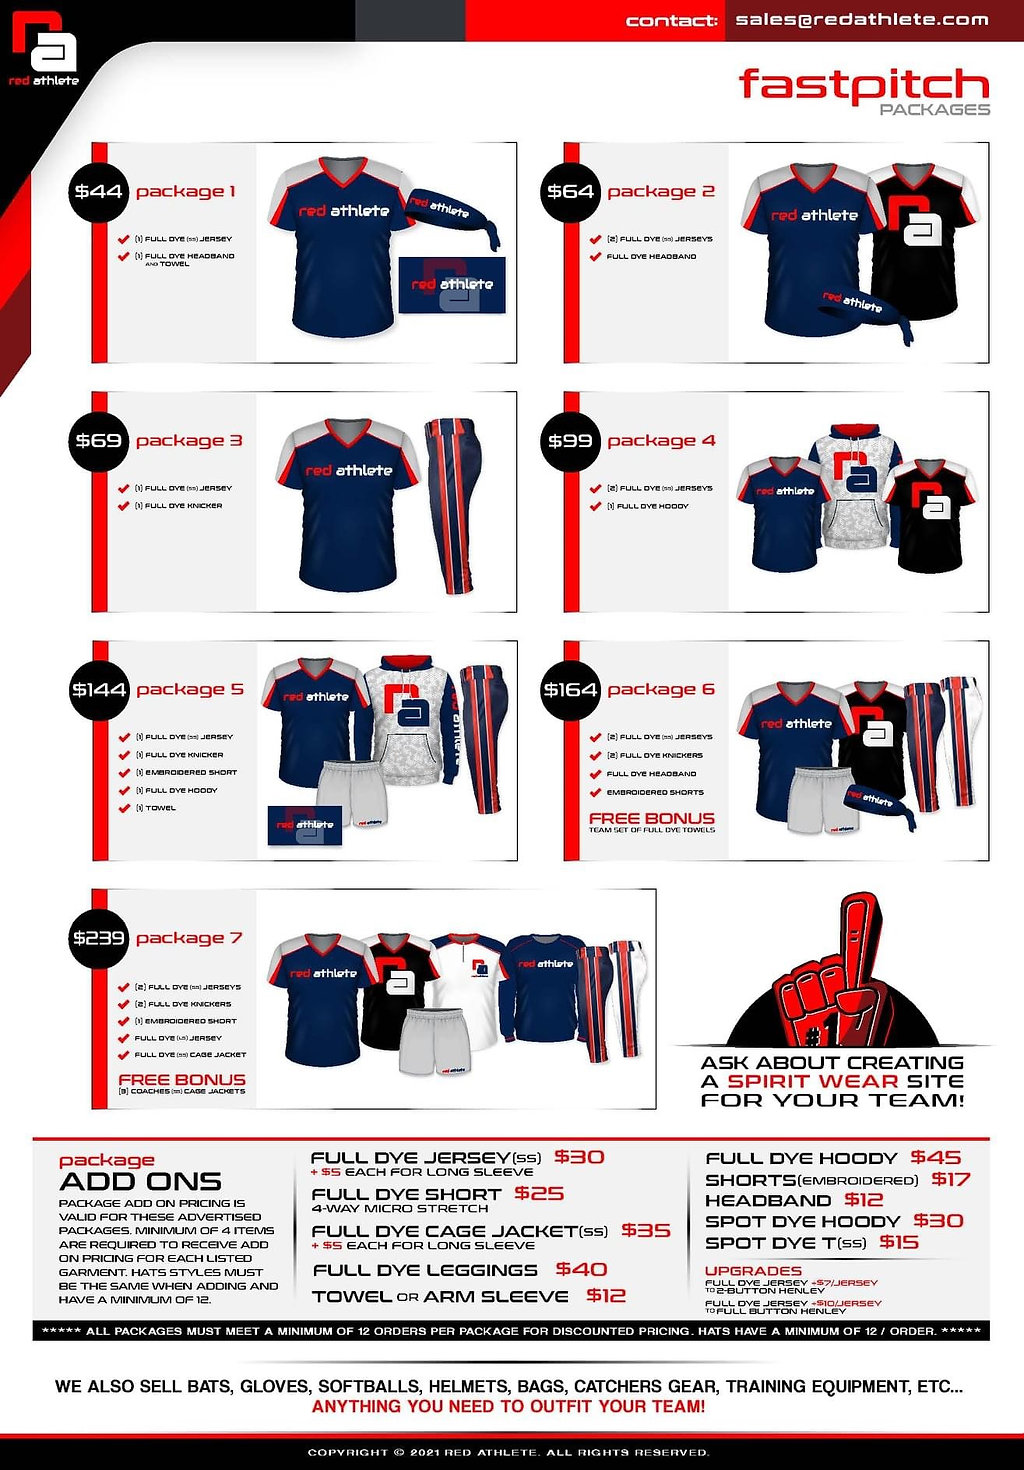 fastpitch uniform sale package